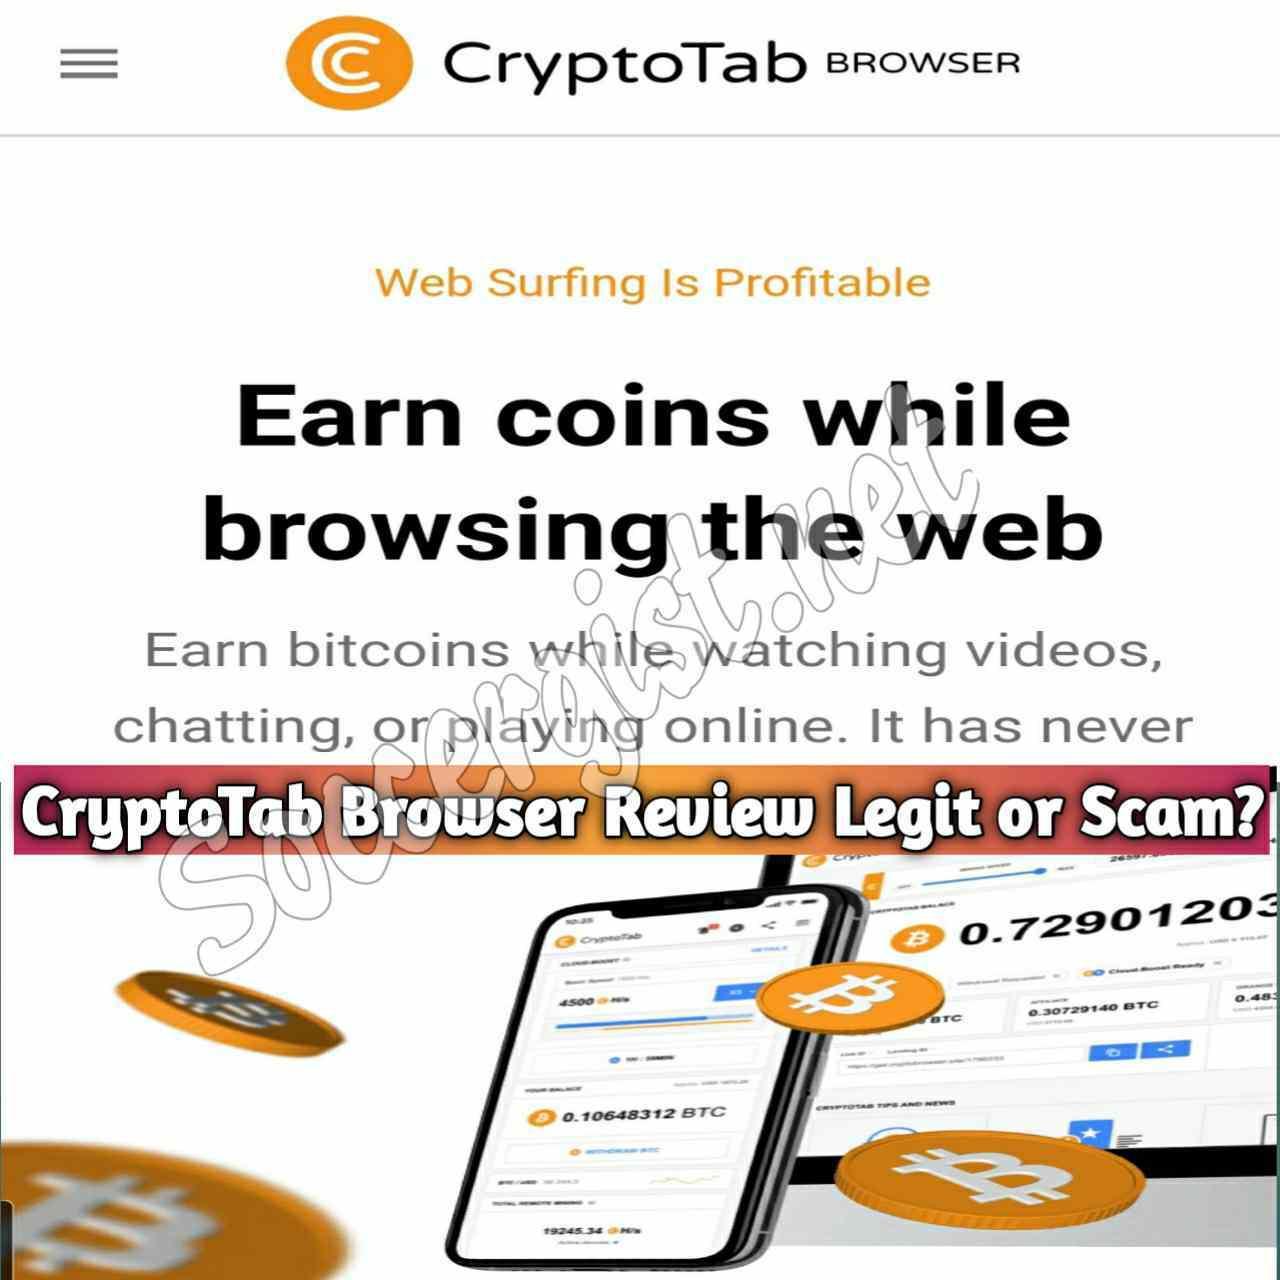 cryptotab-browser-review-legit-or-scam